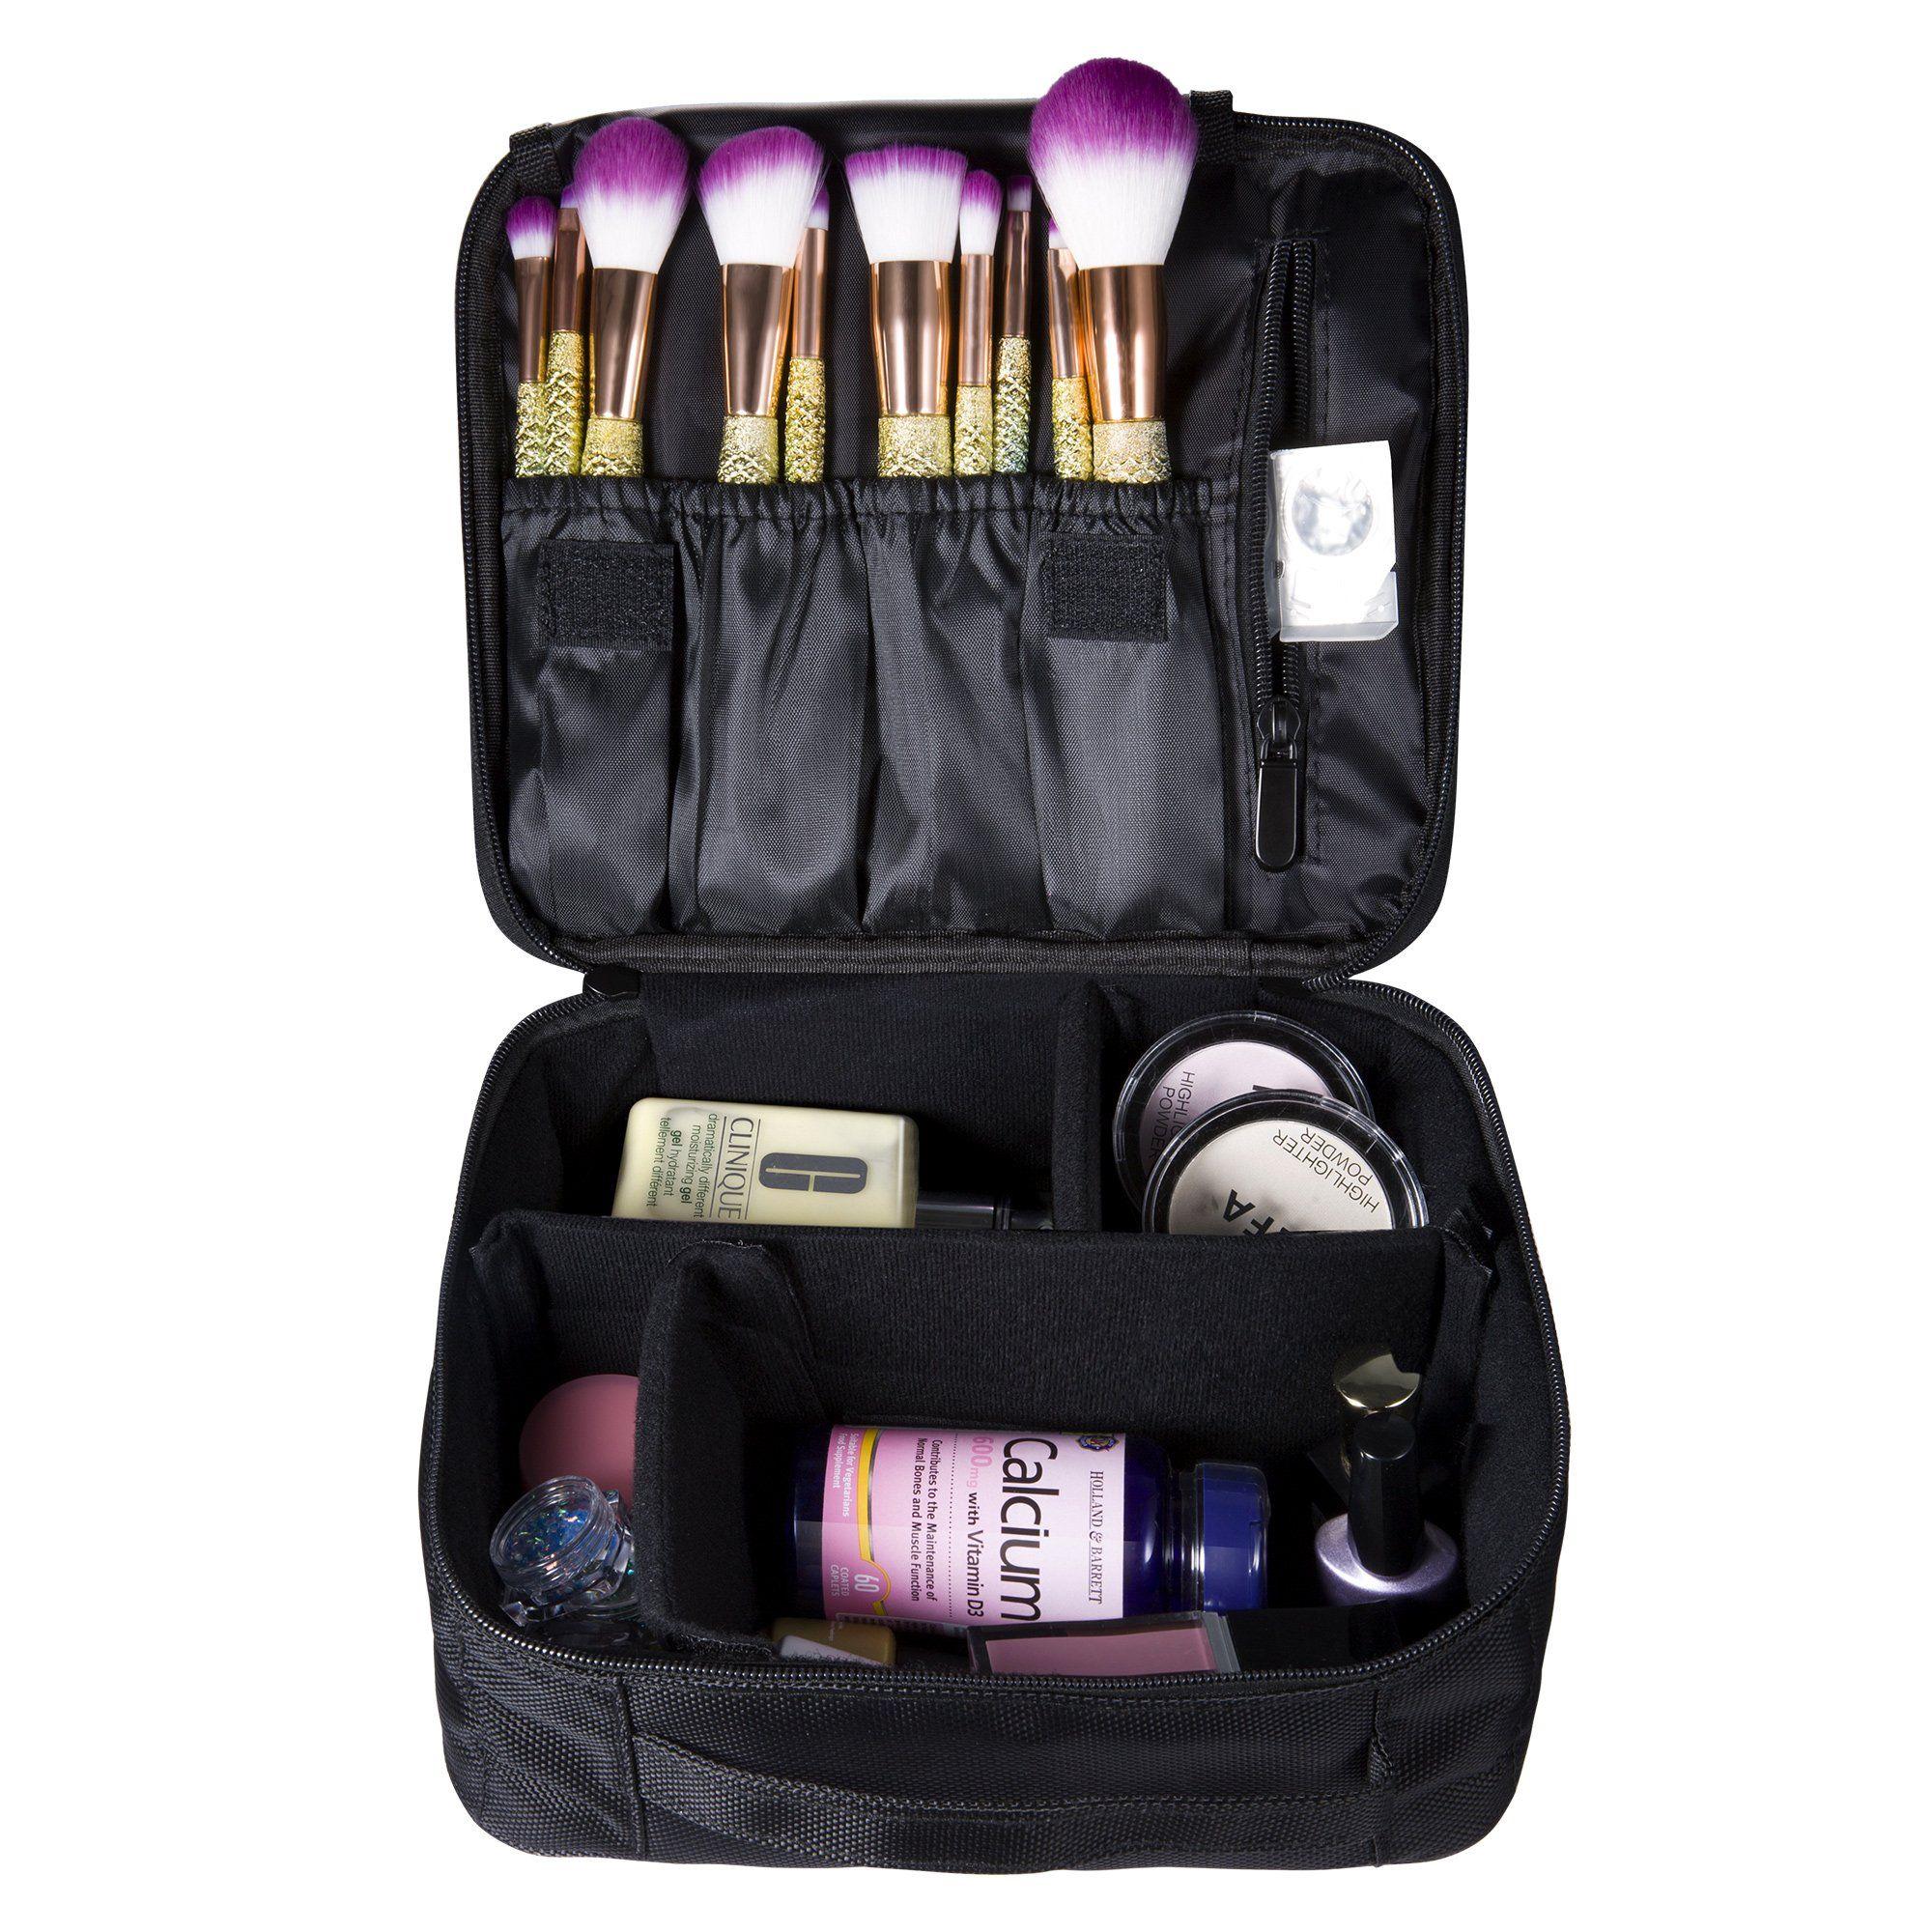 Portable Makeup Cosmetic Bag Train Case Large Capacity Waterproof Organizer  Bag by NATPLUS 8dbf4510abc62